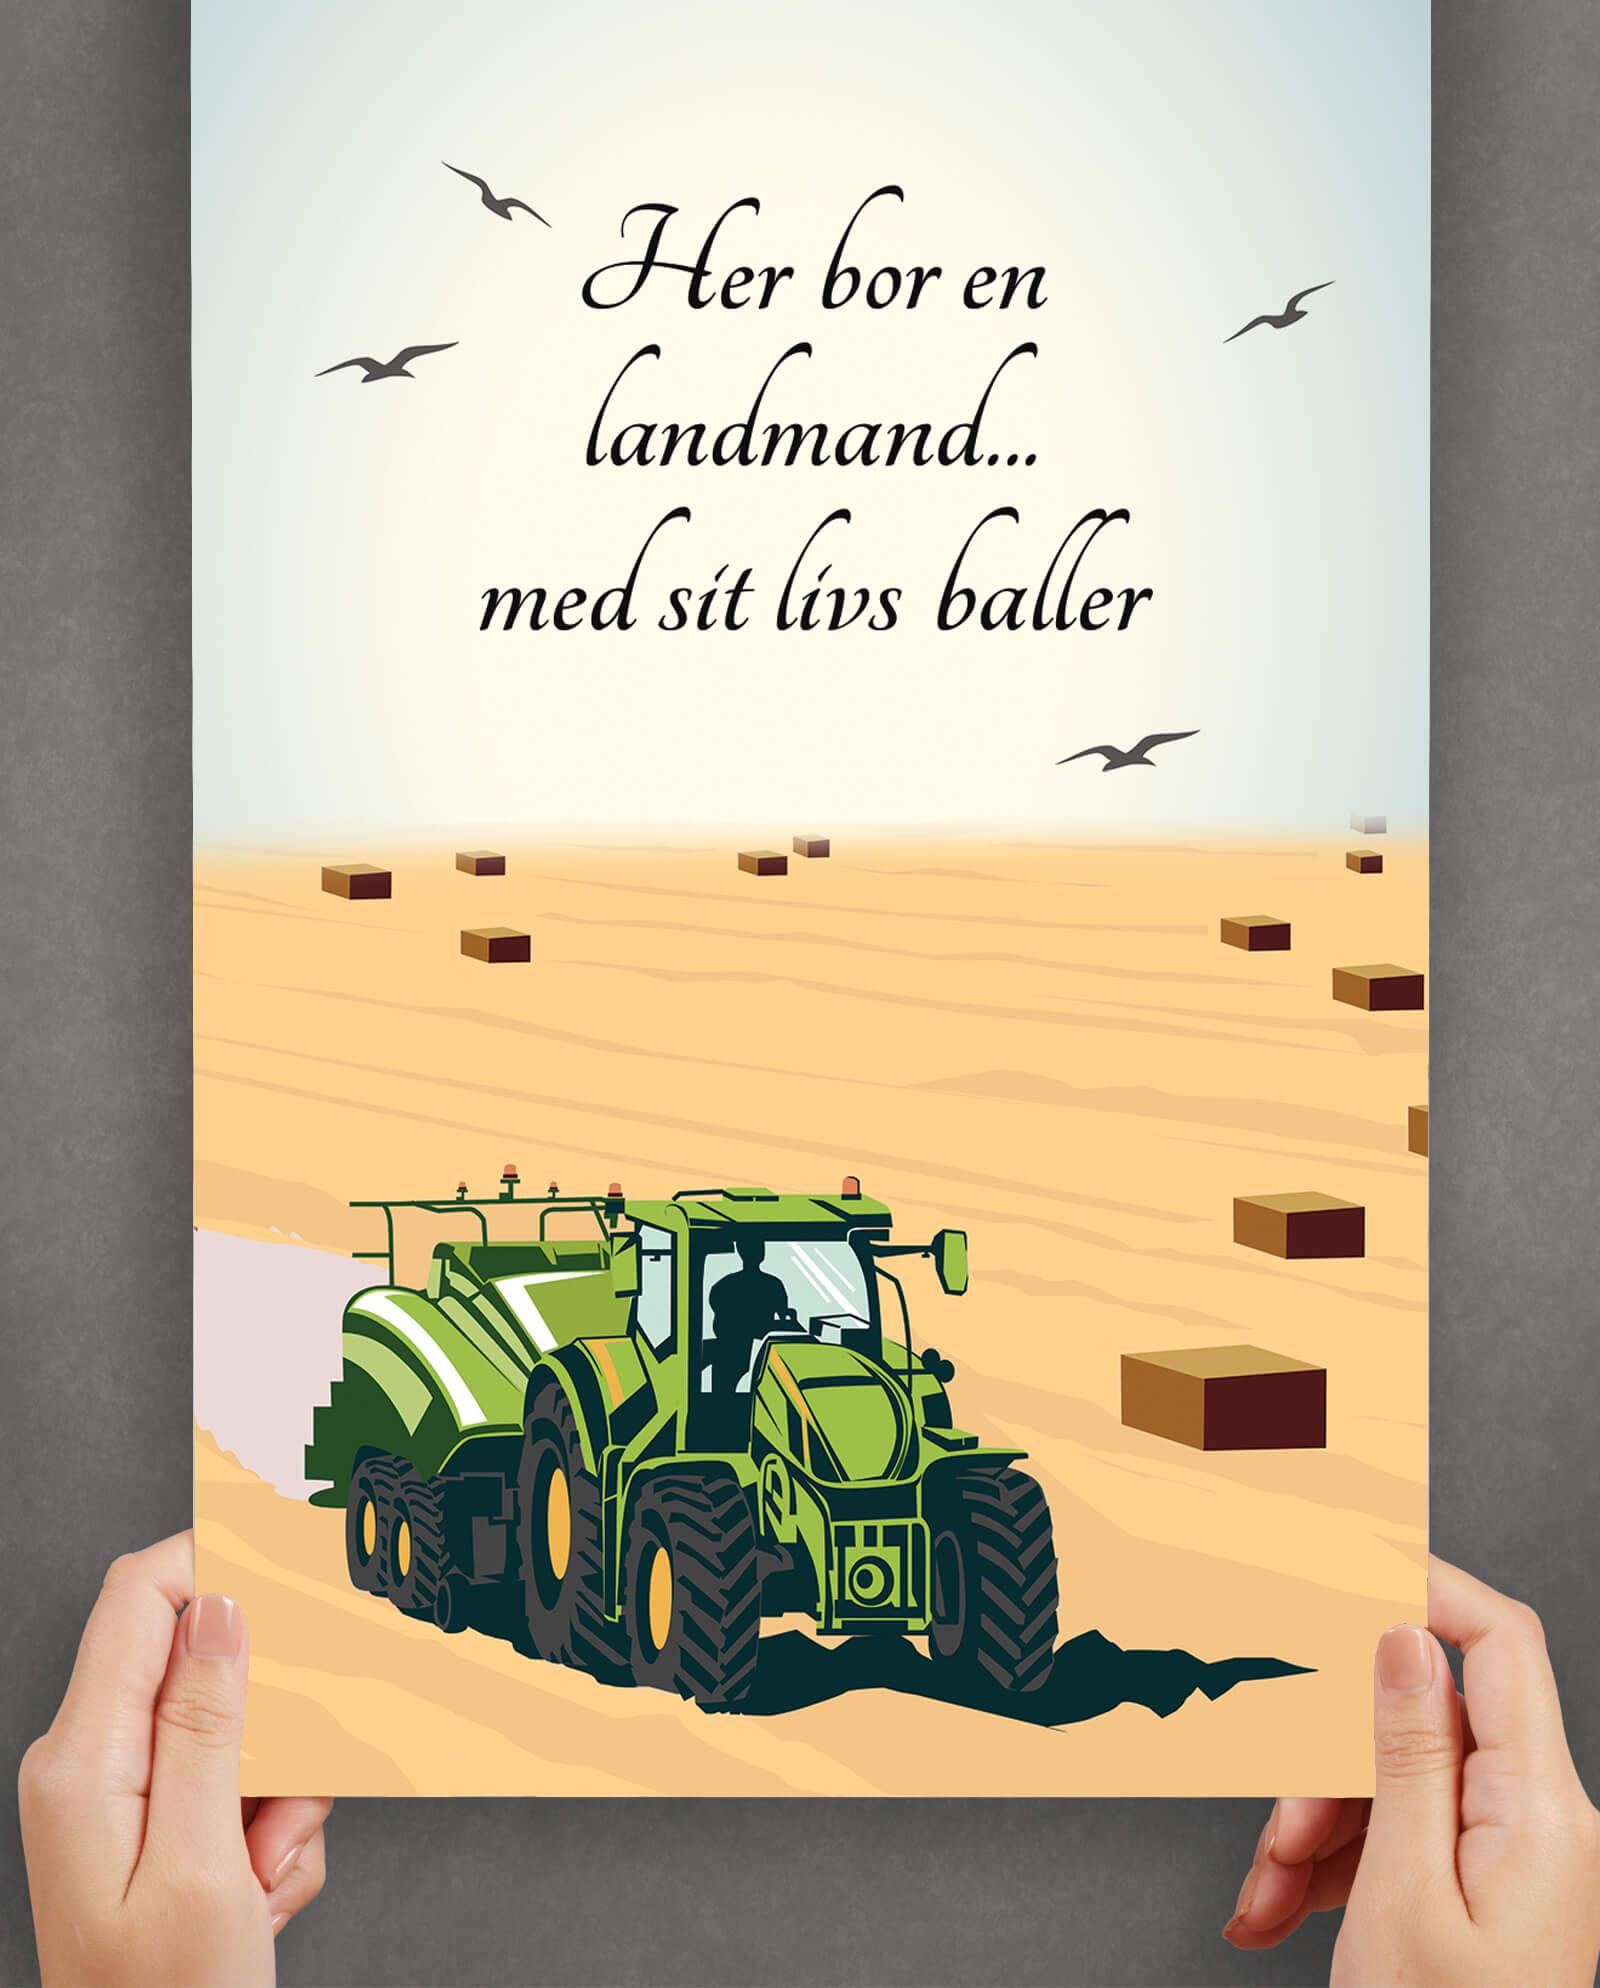 landmand-arbejde-baller-3